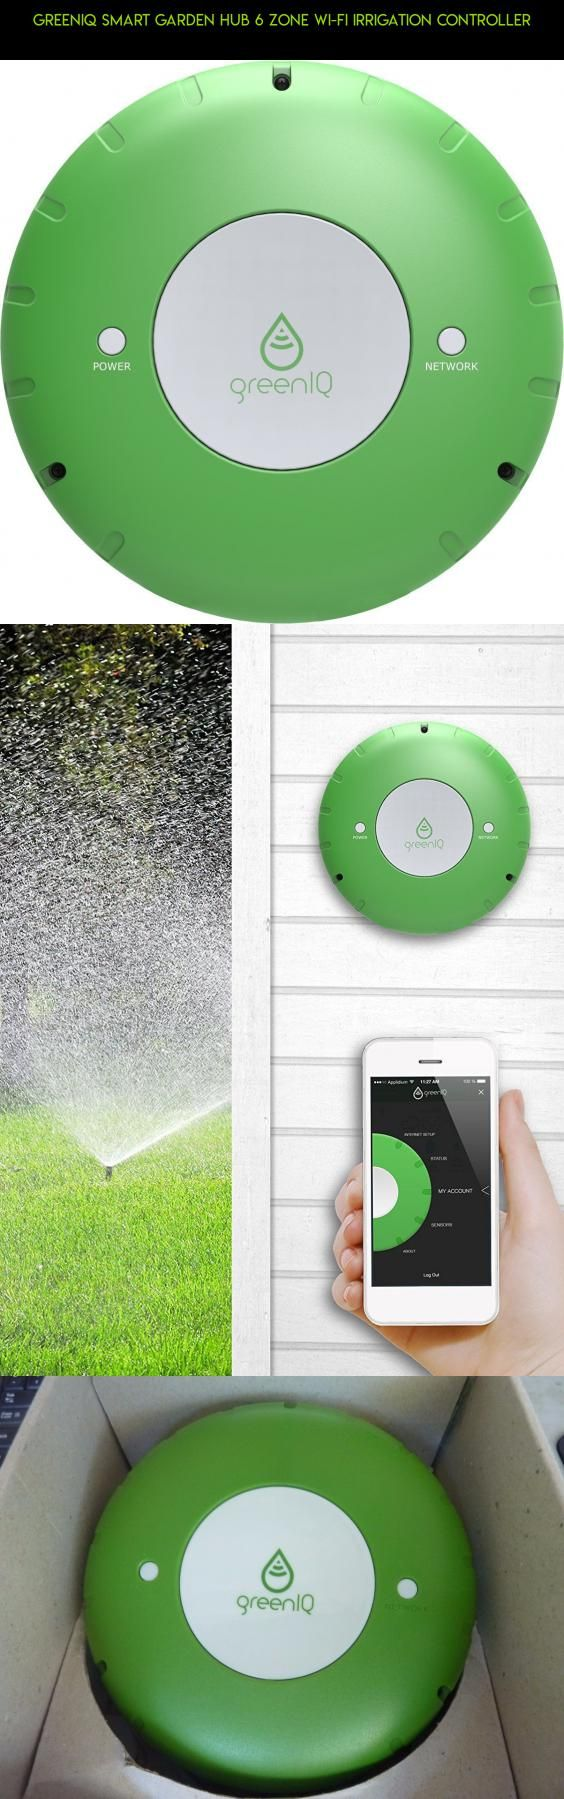 Perfect GreenIQ Smart Garden Hub Zone Wi Fi Irrigation Controller parts camera